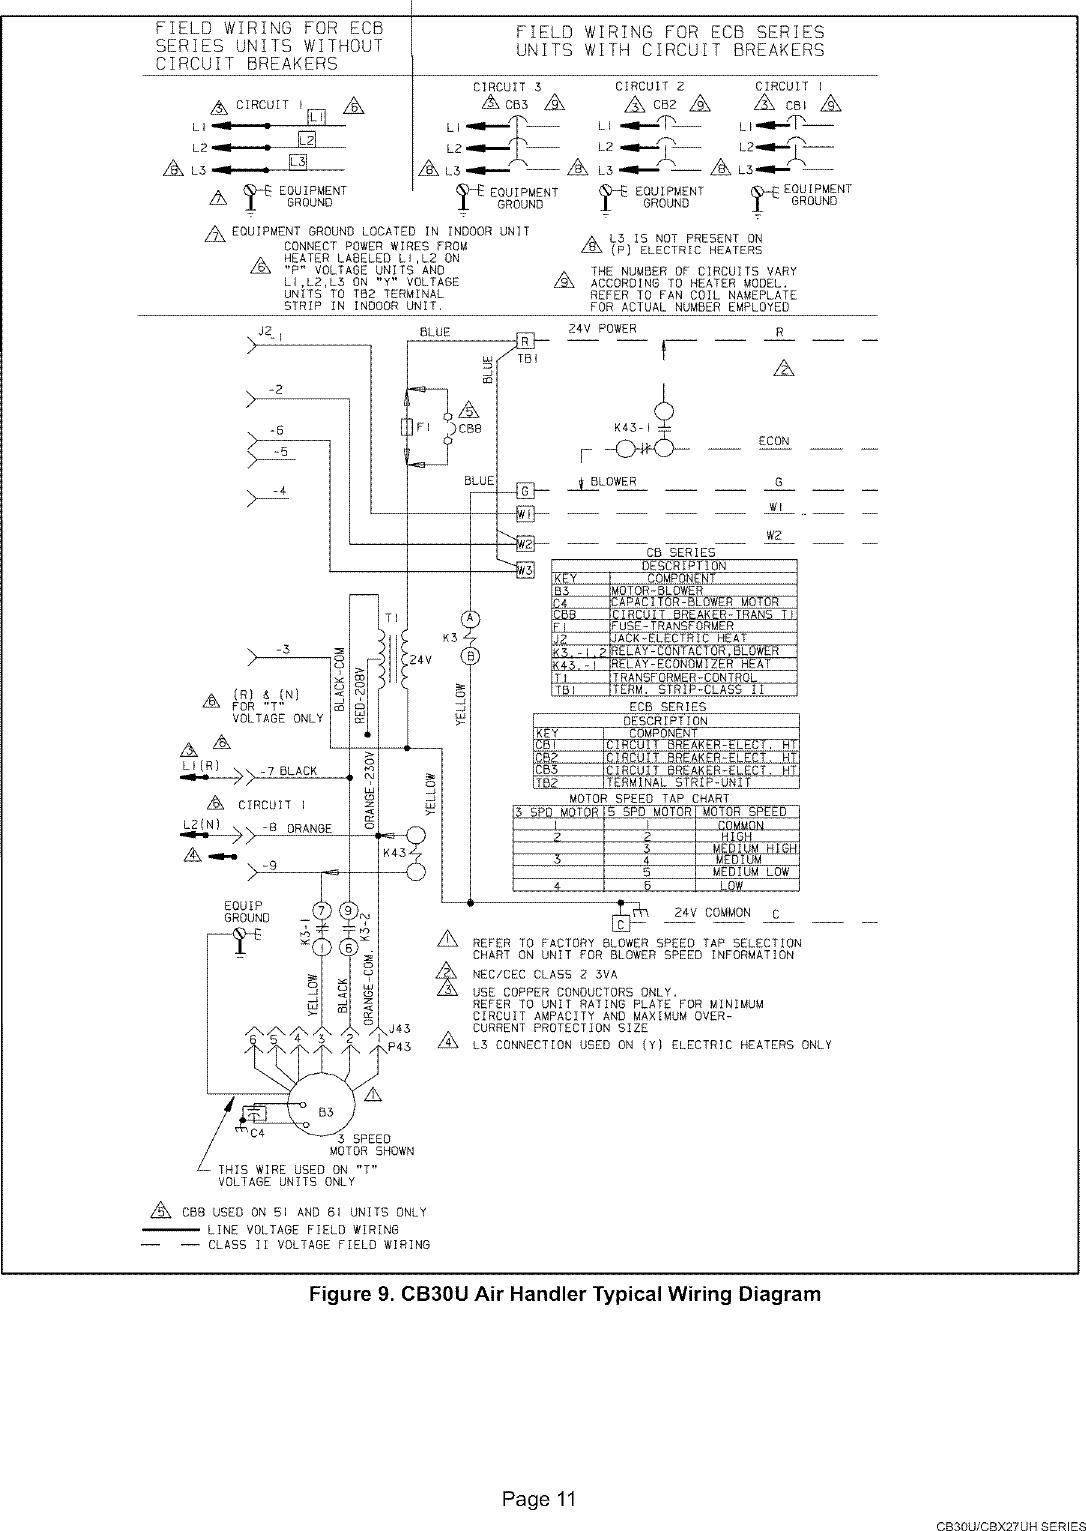 hight resolution of lennox air handler indoor blower u0026evap manual l0805327page 11 of 12 lennox air